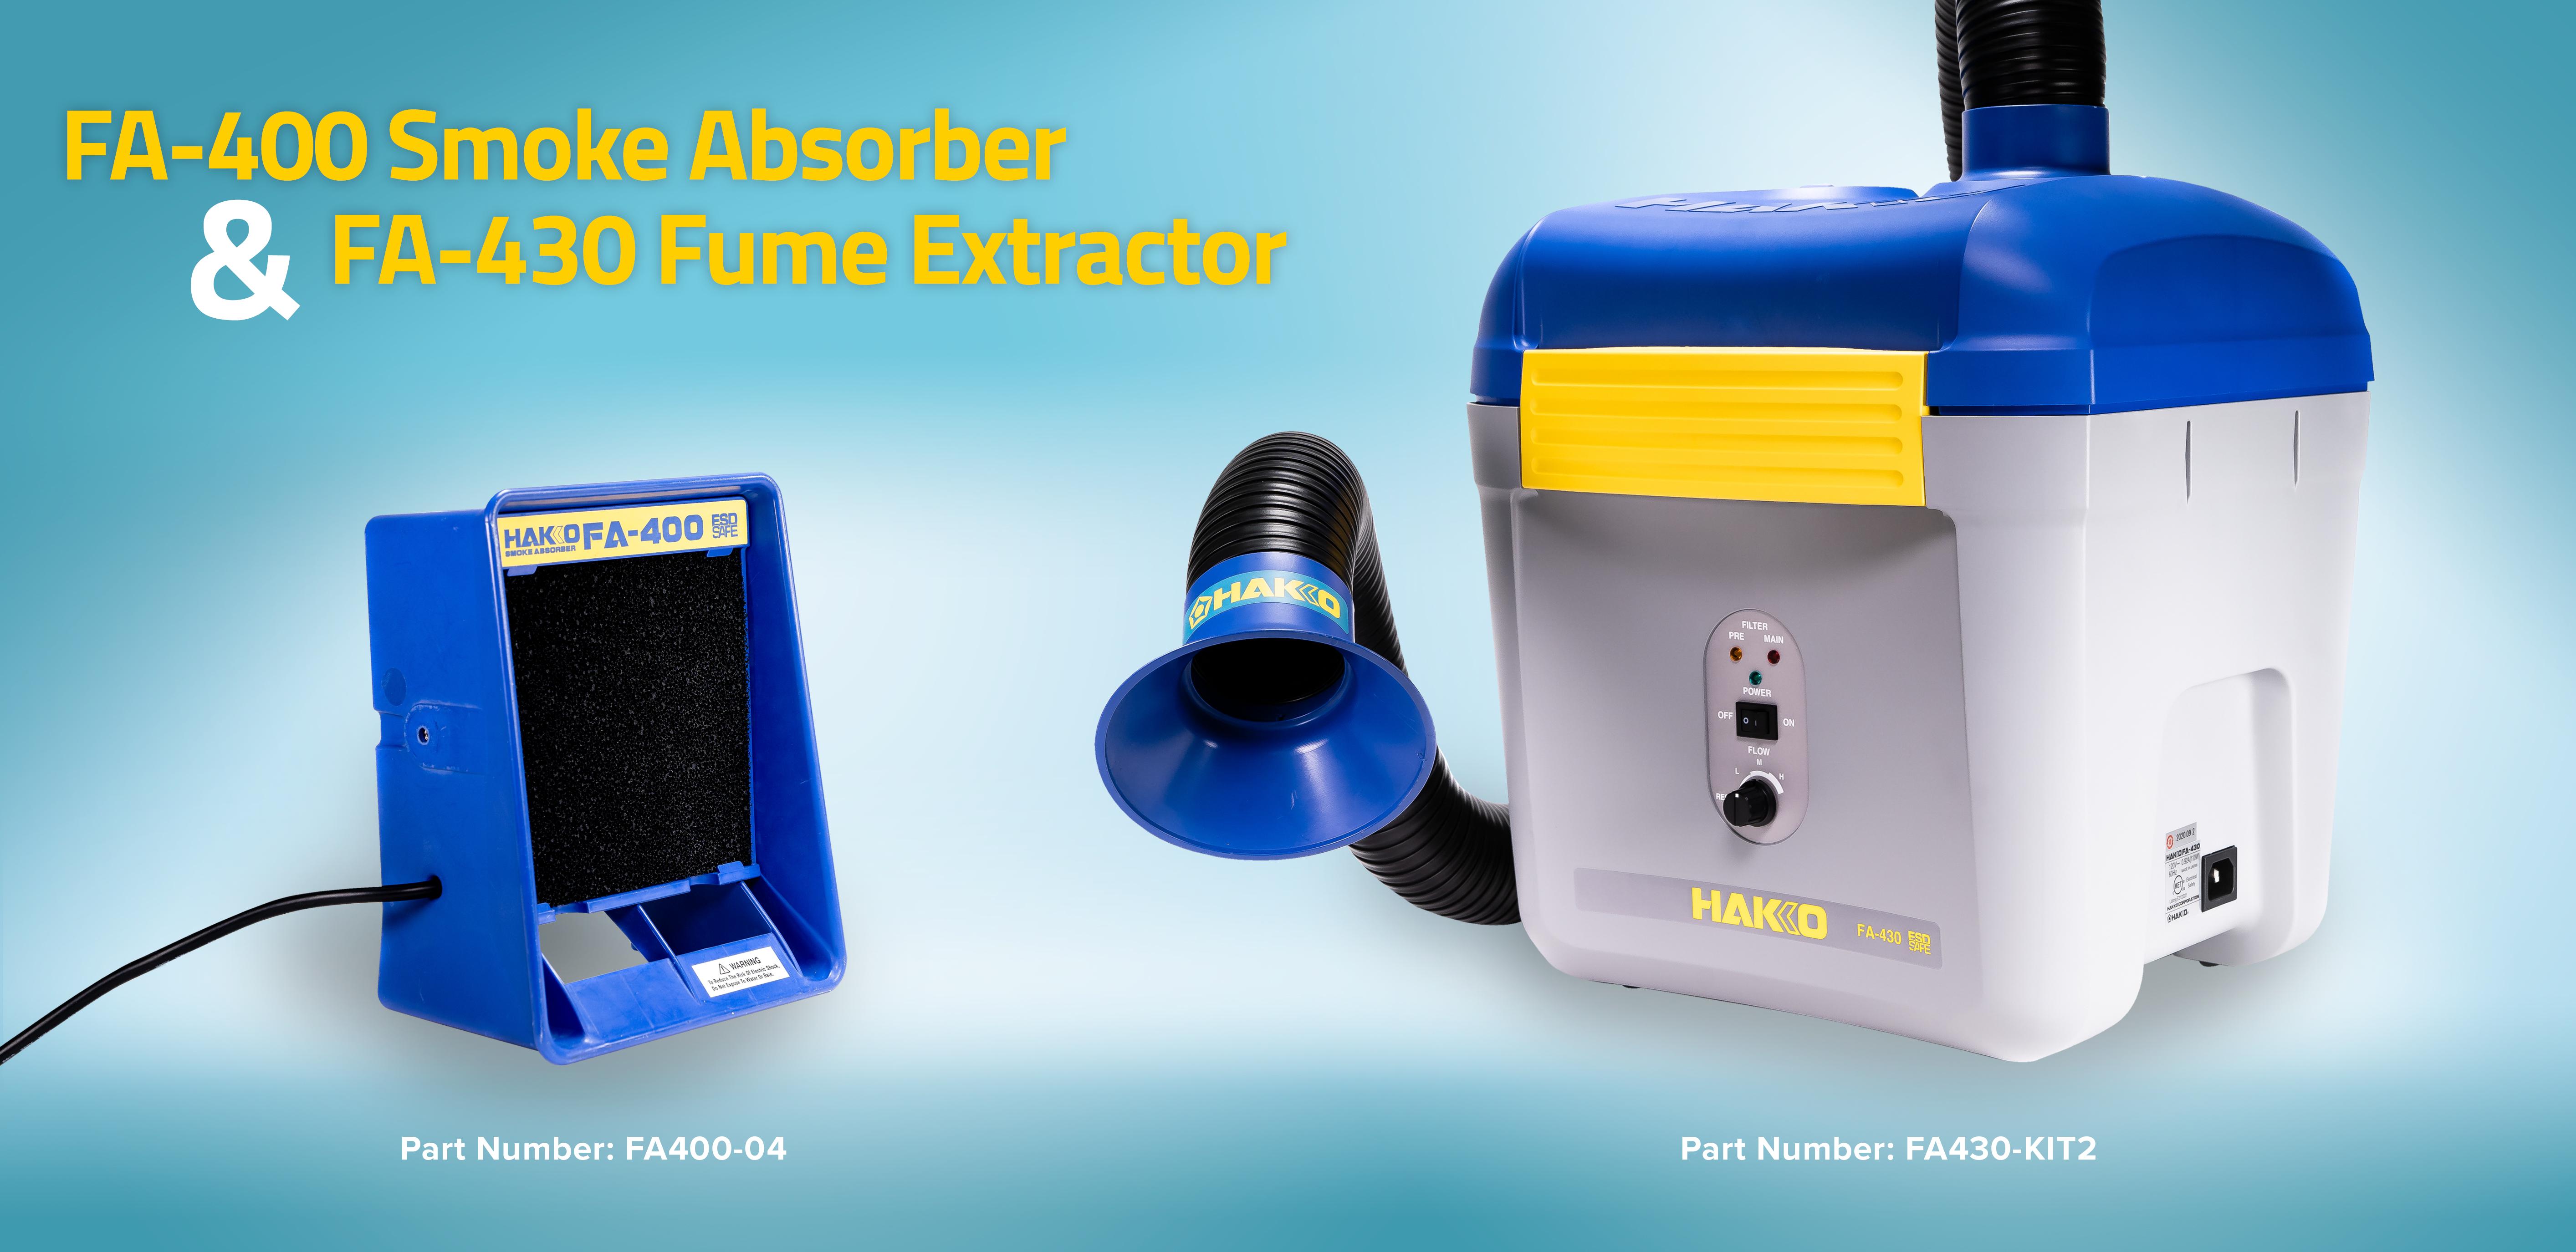 Hakko Smoke Absorber and Fume Extractor